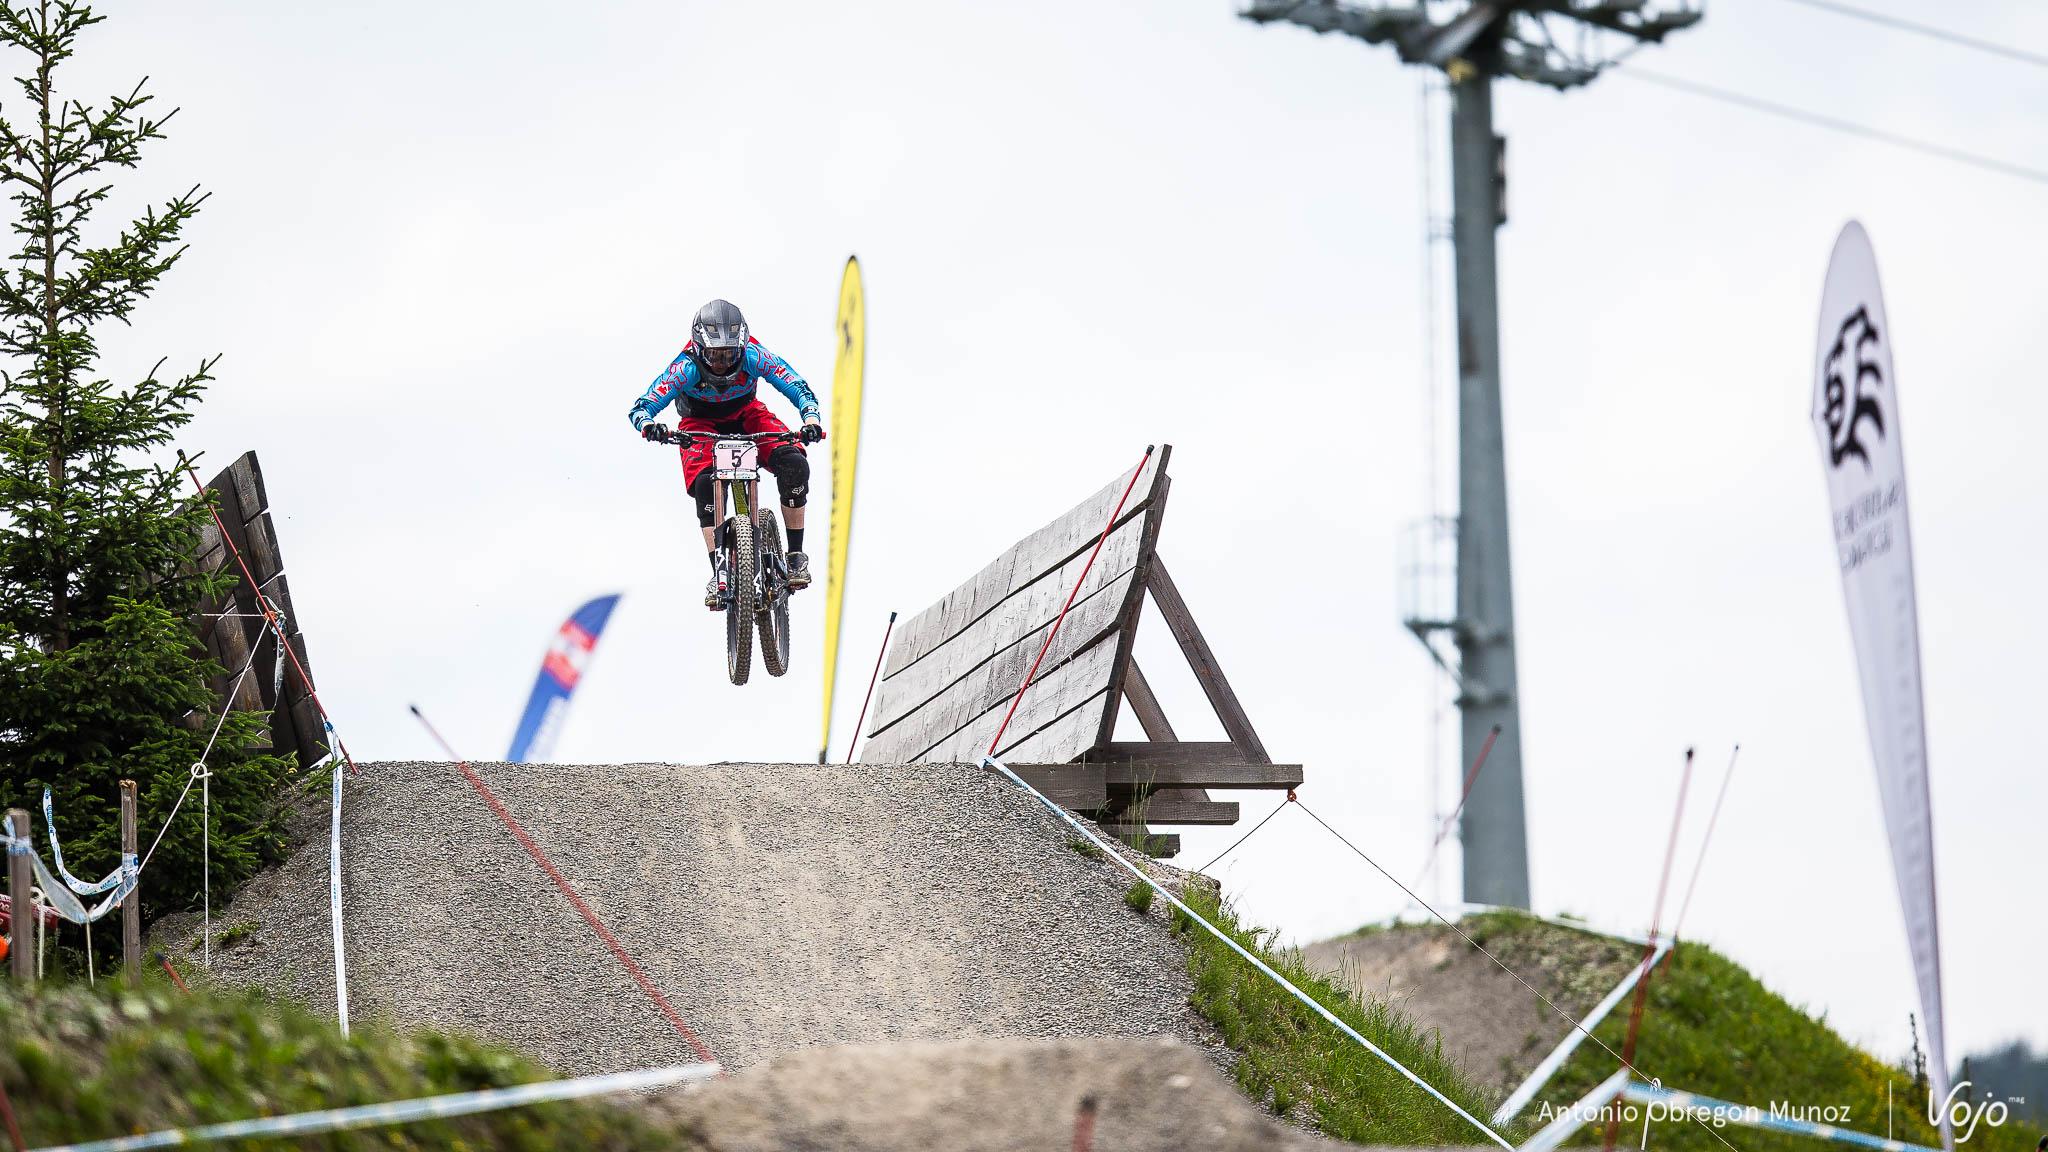 Leogang_UCI_World_Cup_DH_2015_(Porfolio)_(Seagrave)_(Copyright_Antonio_Obregon_VojoMag-36